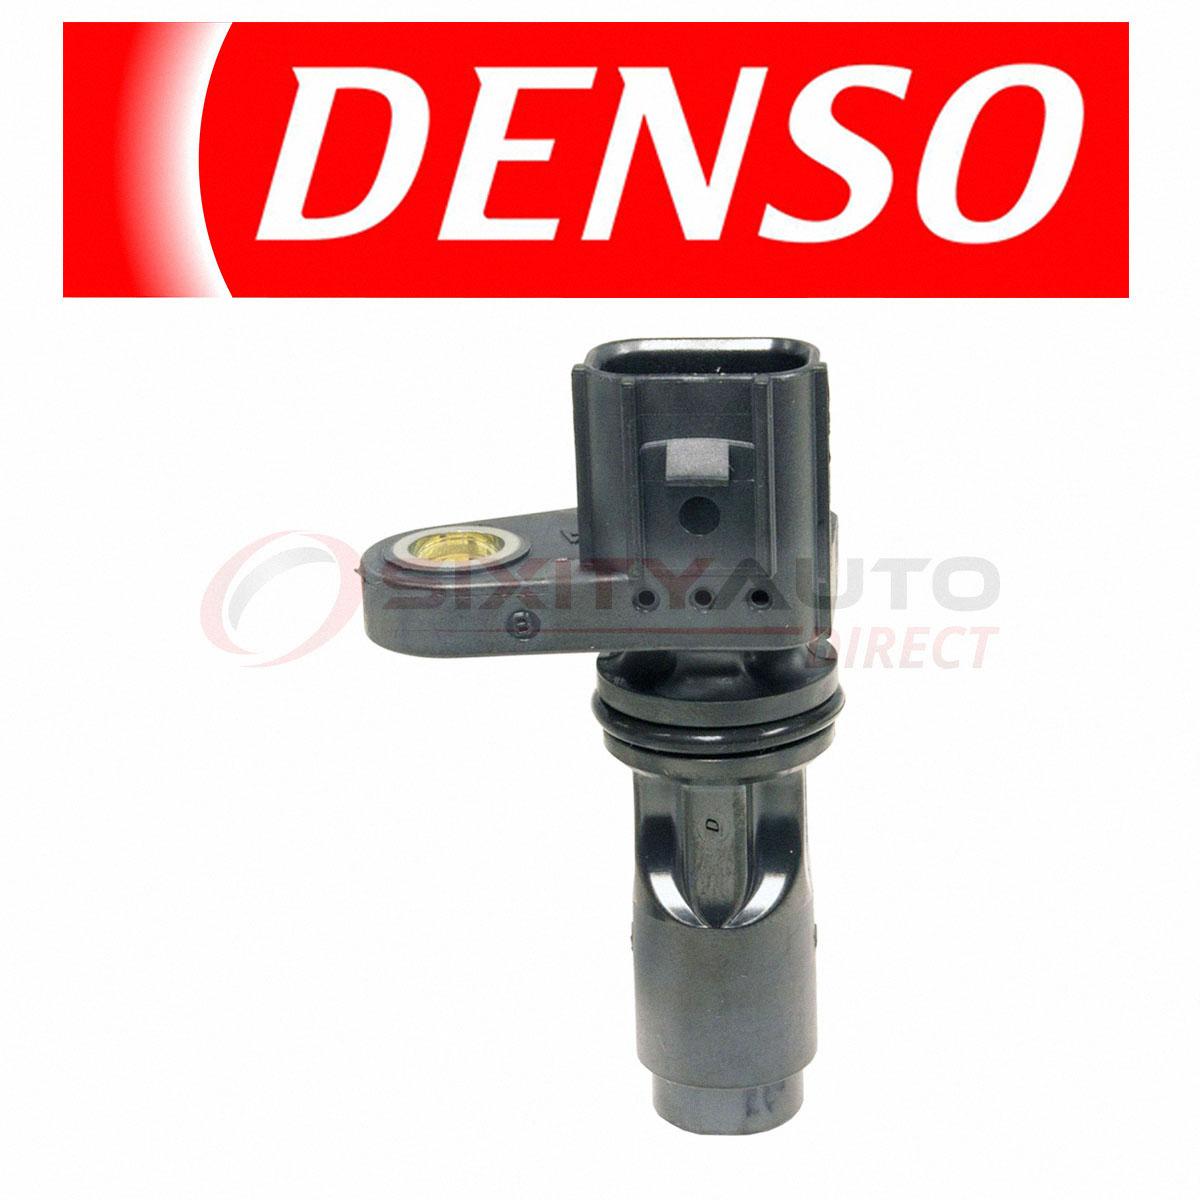 Holstein Parts  2CRK0298 Crankshaft Position Sensor